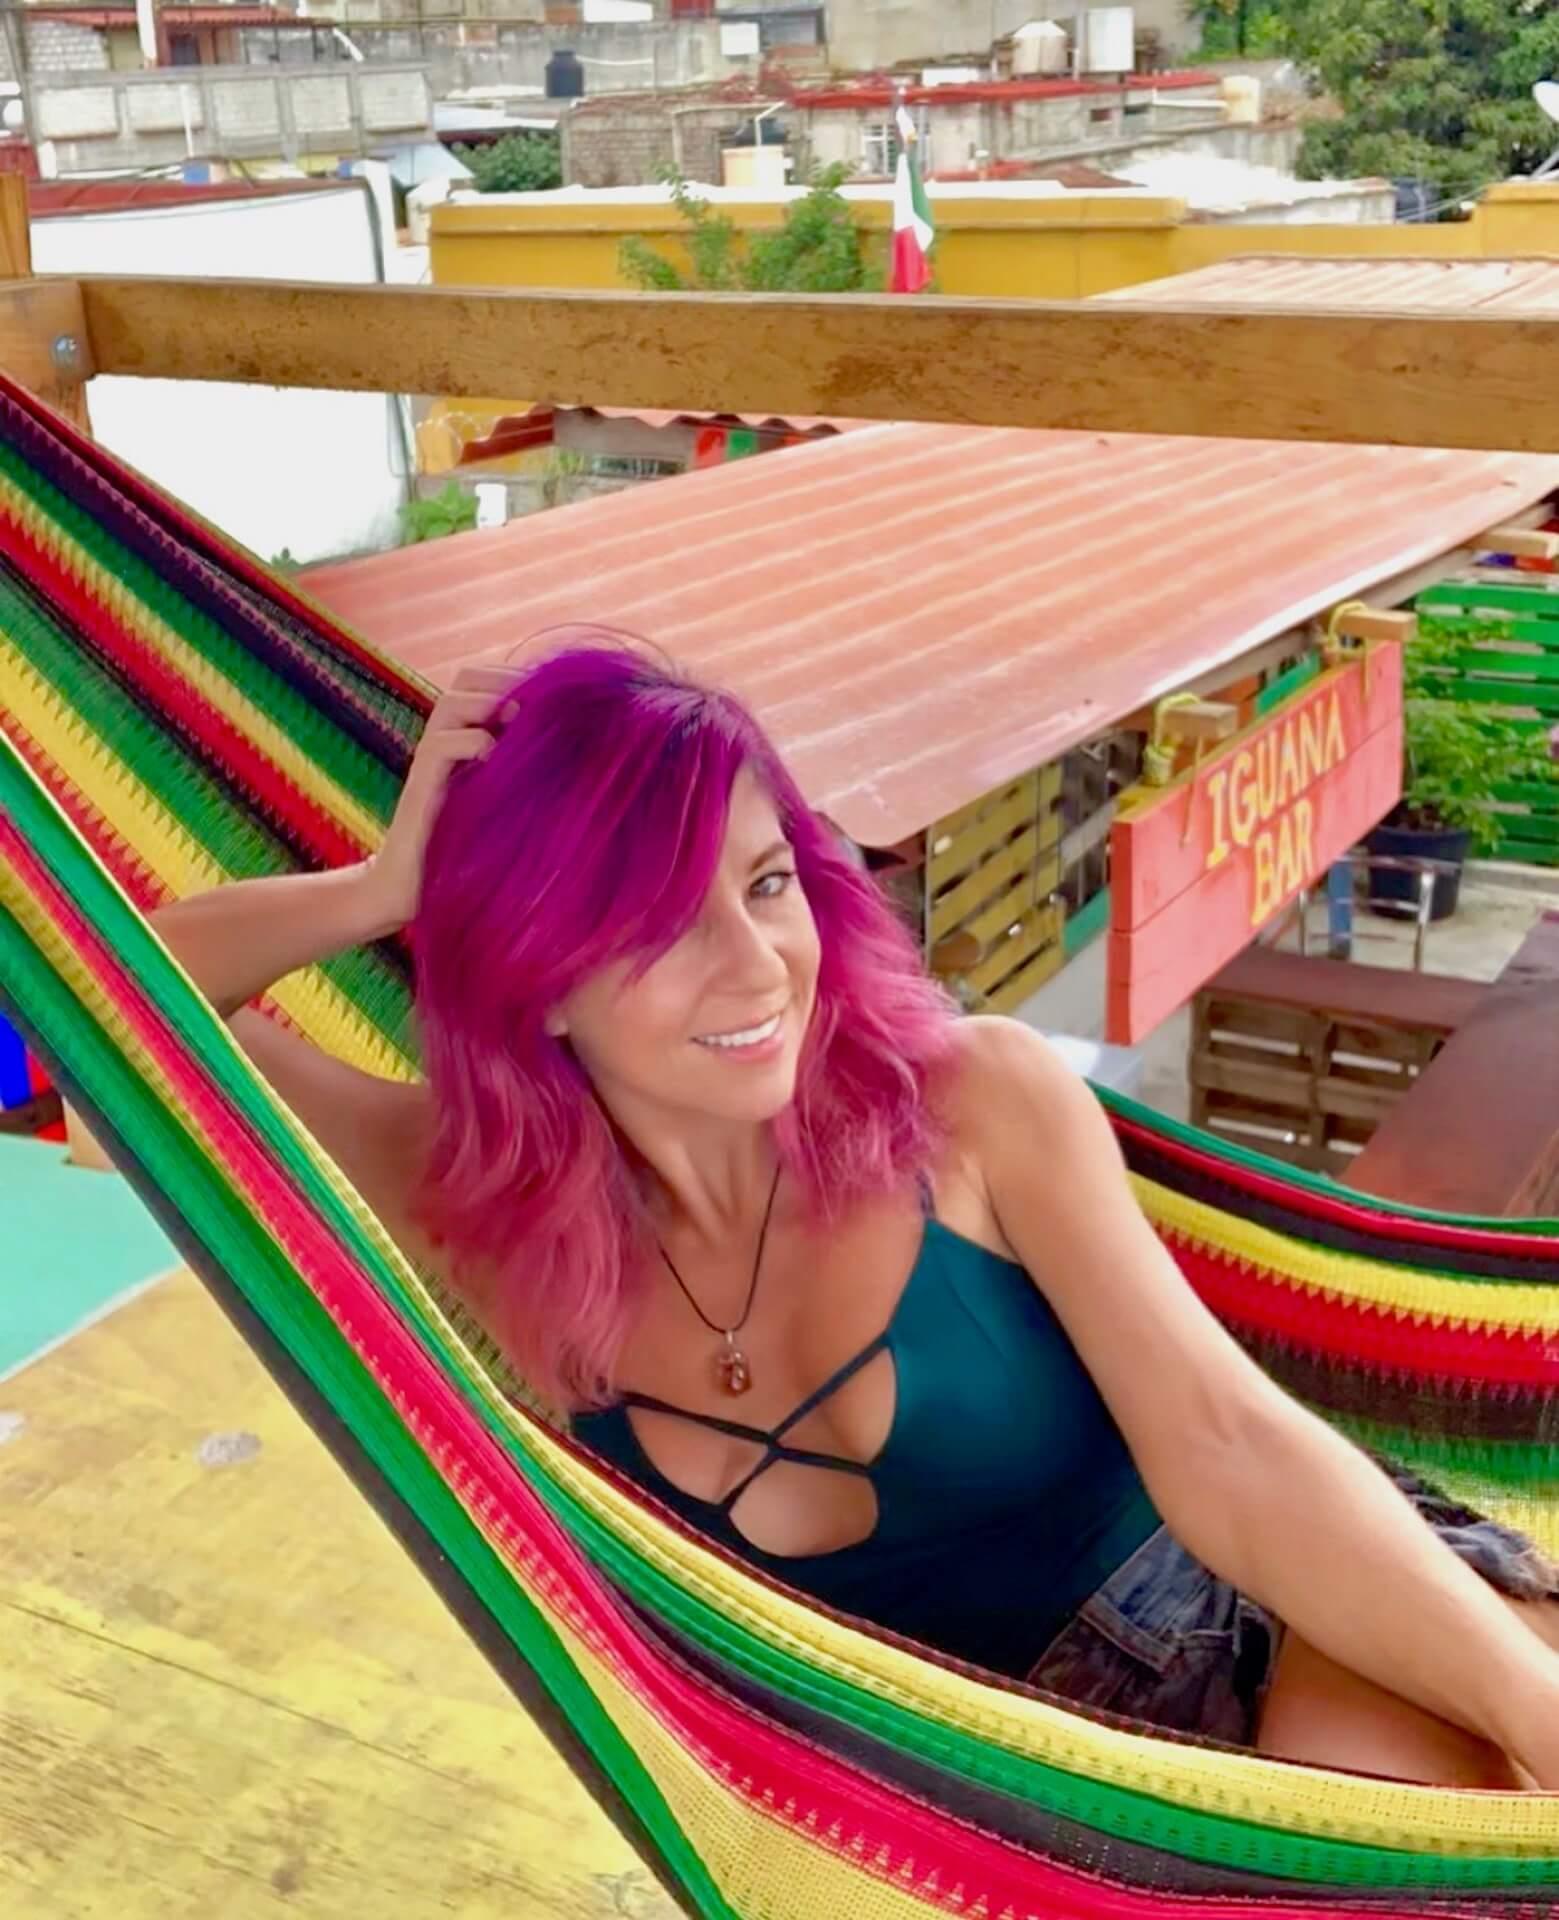 vanlife beauty routine non-toxic vegan eco-friendly vacay vans blog Instagram solo female travel digital nomad